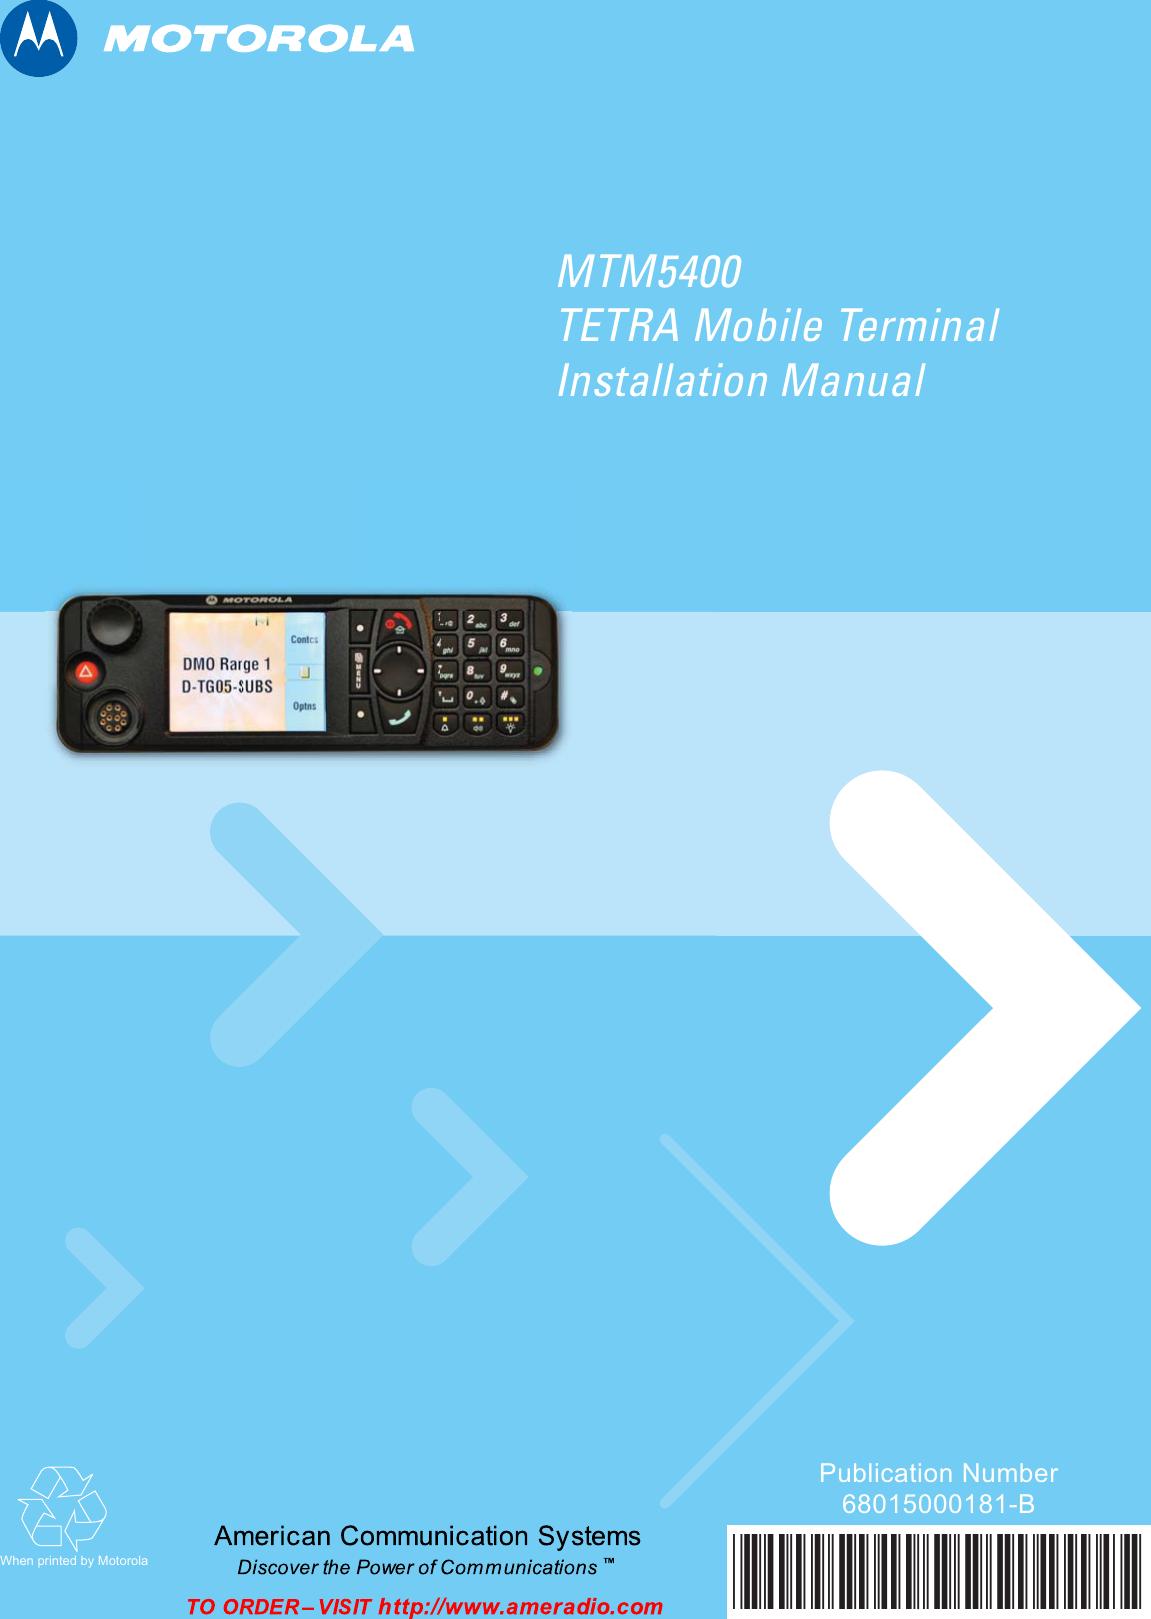 Motorola Crib Toy Mtm5400 Users Manual TETRA Mobile Terminal